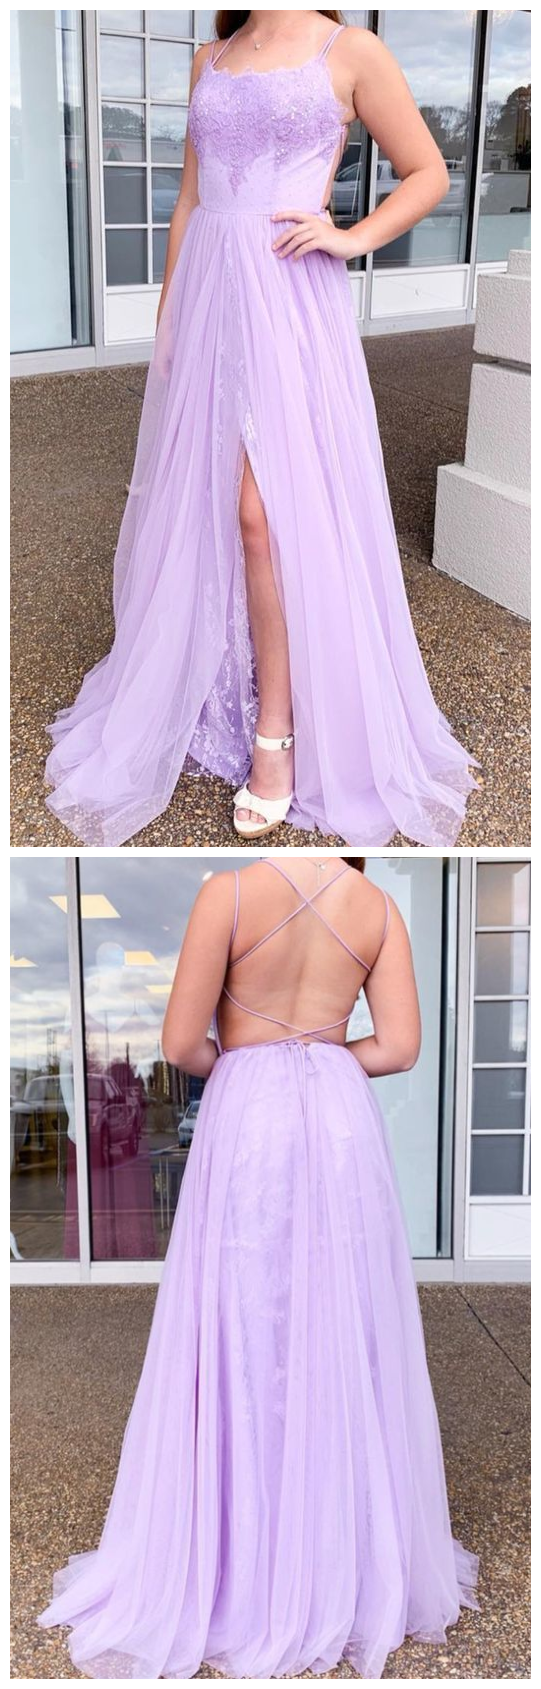 2020 lilac prom dress, A-line long prom dress